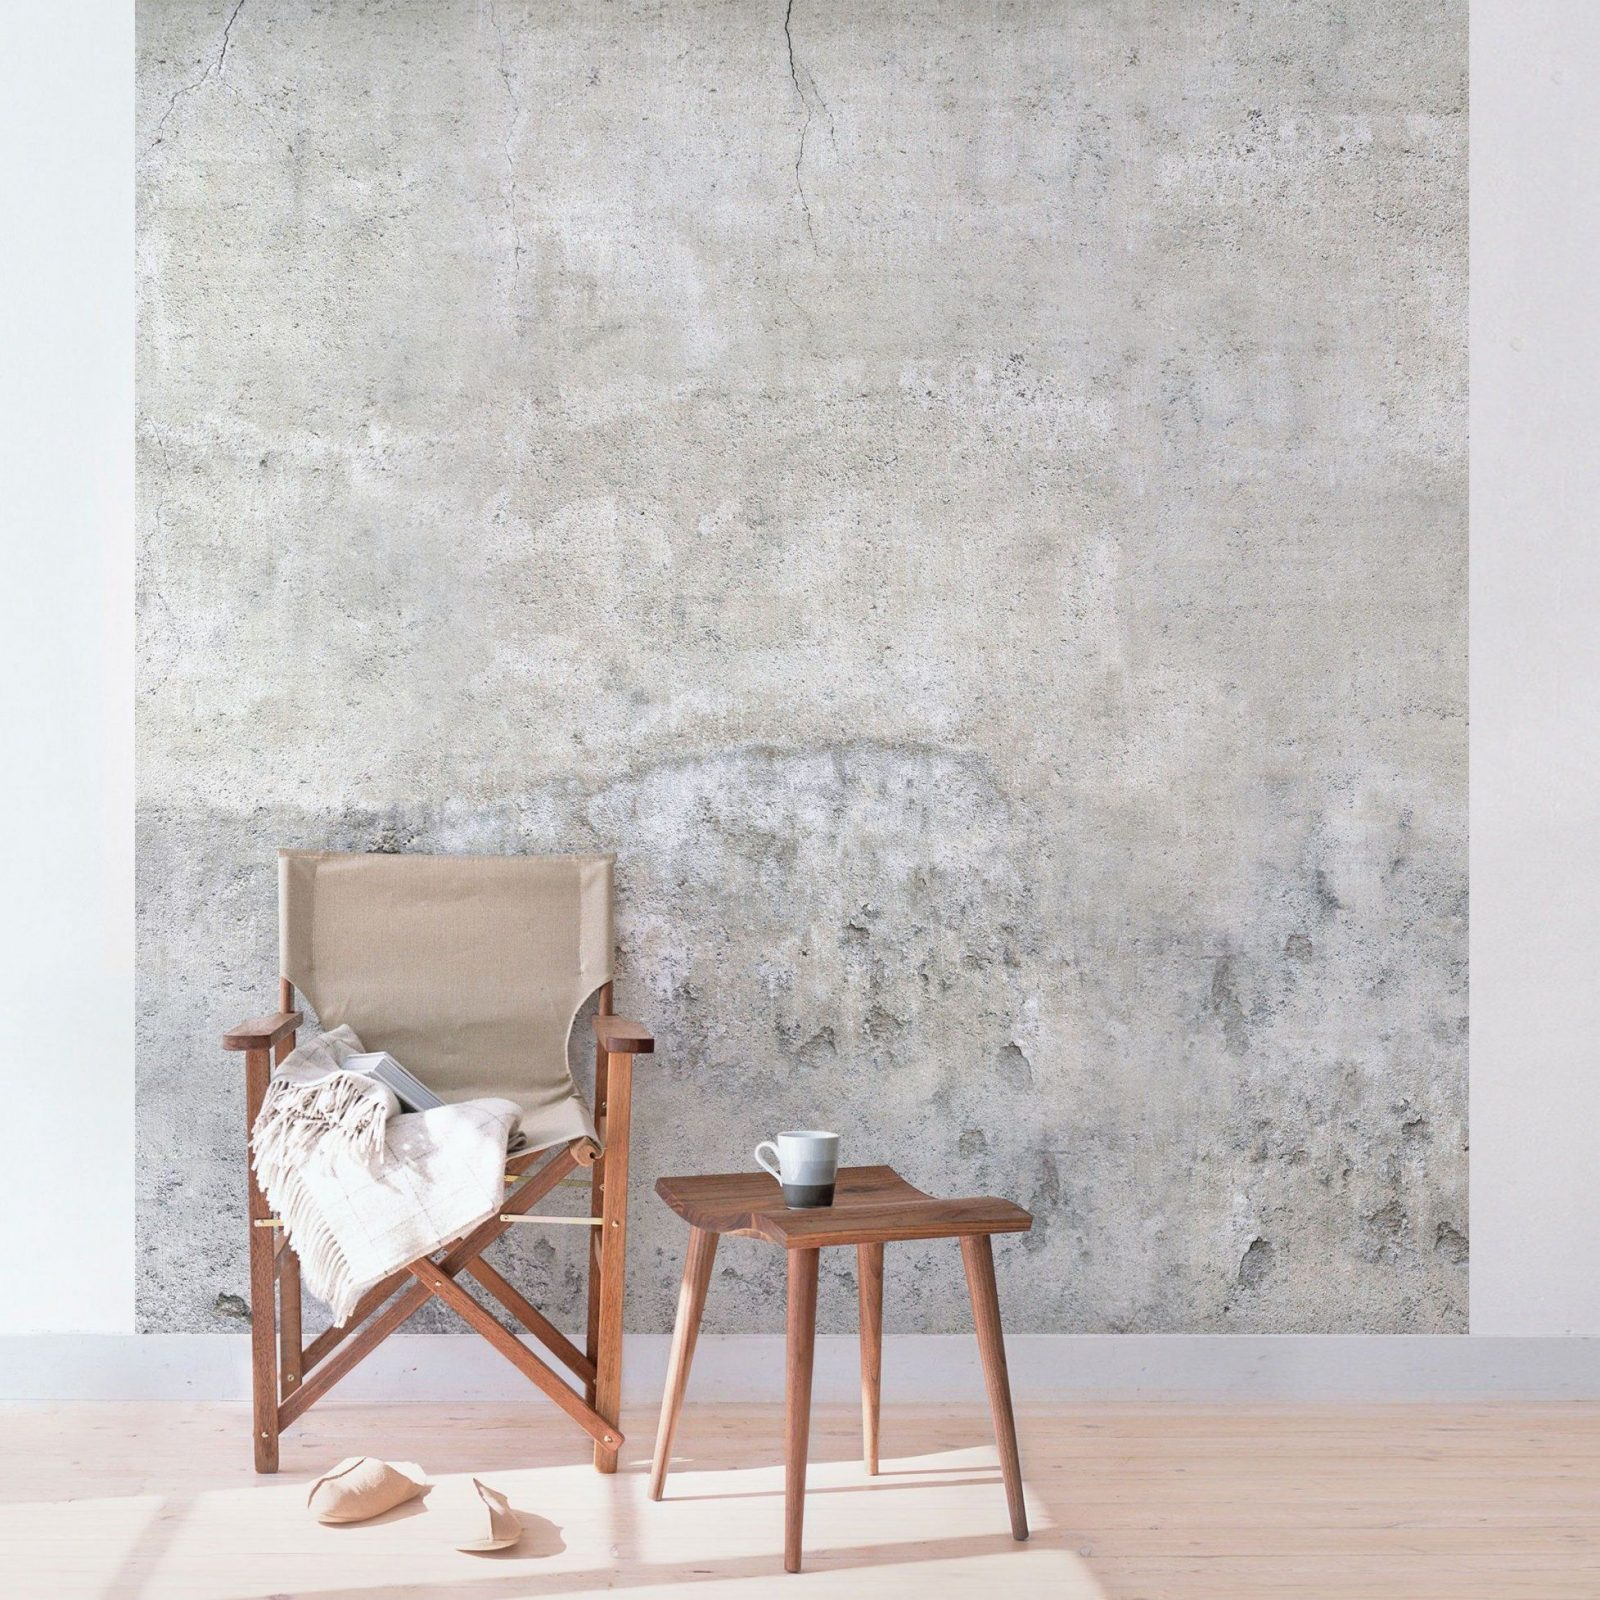 Tapete Betonoptik  Shabby Betonoptik Tapete  Vliestapete Quadrat von Schöne Wände Ohne Tapete Bild